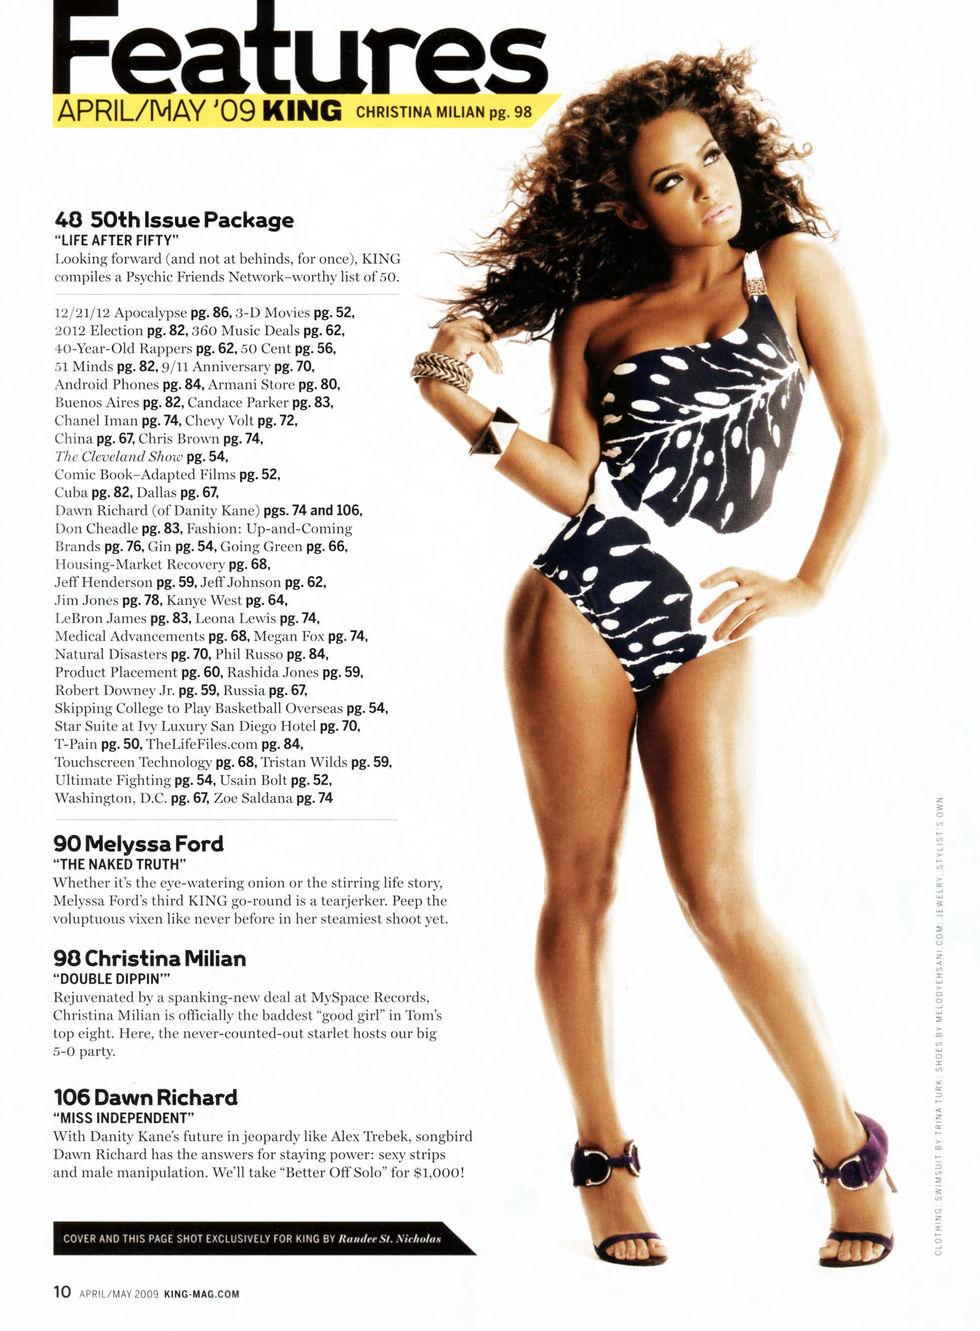 christina-milian-king-magazine-aprilmay-2009-01